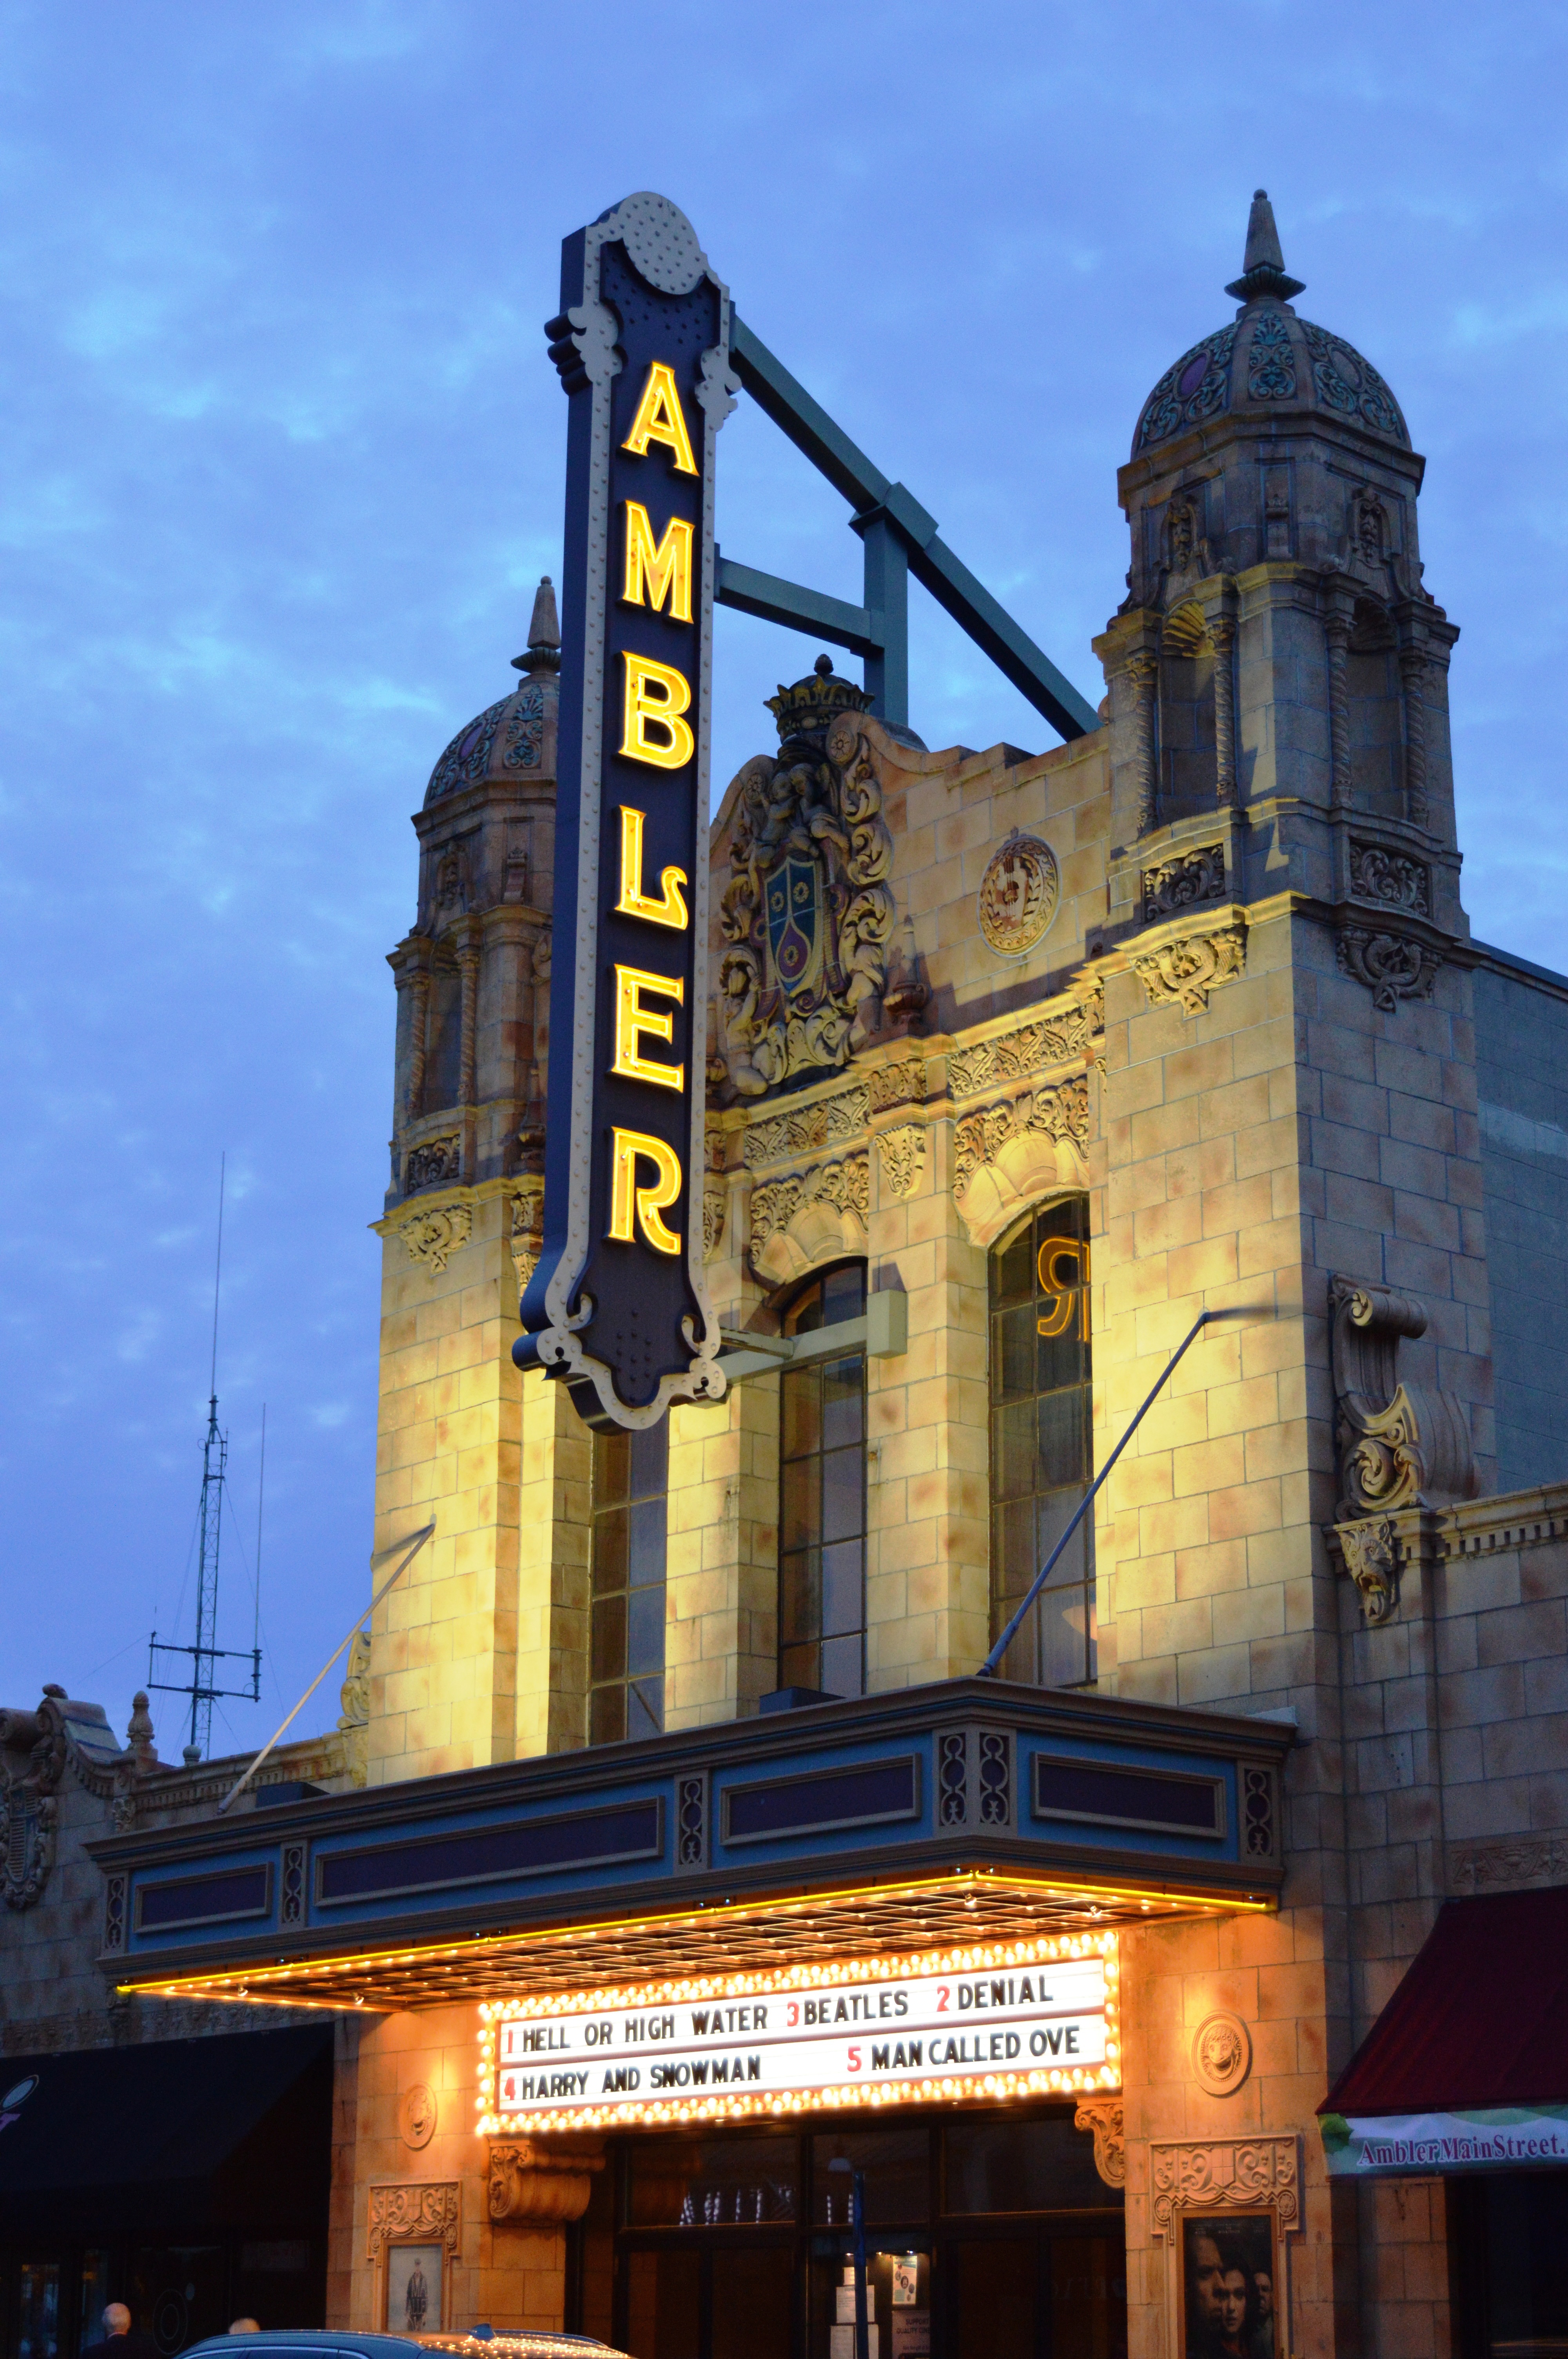 Ambler_Theater_at_night.jpg